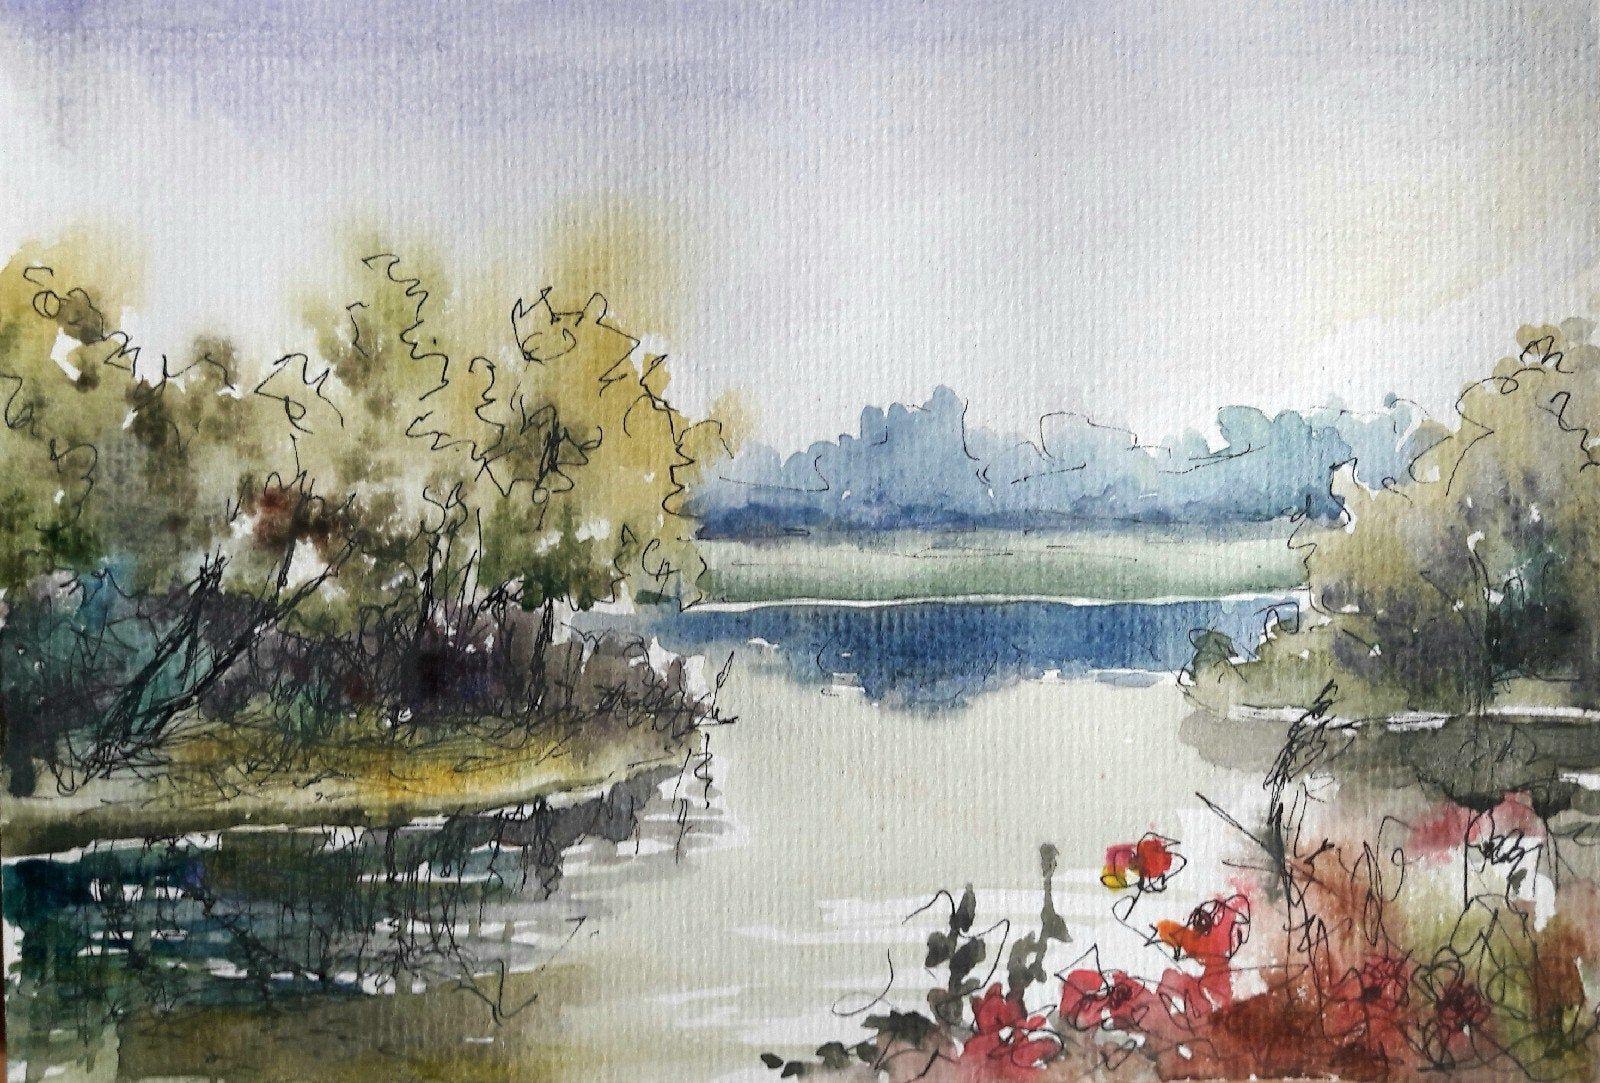 Aquarell Grafik Bilder Original Landschaft Blumen See Abstrakt